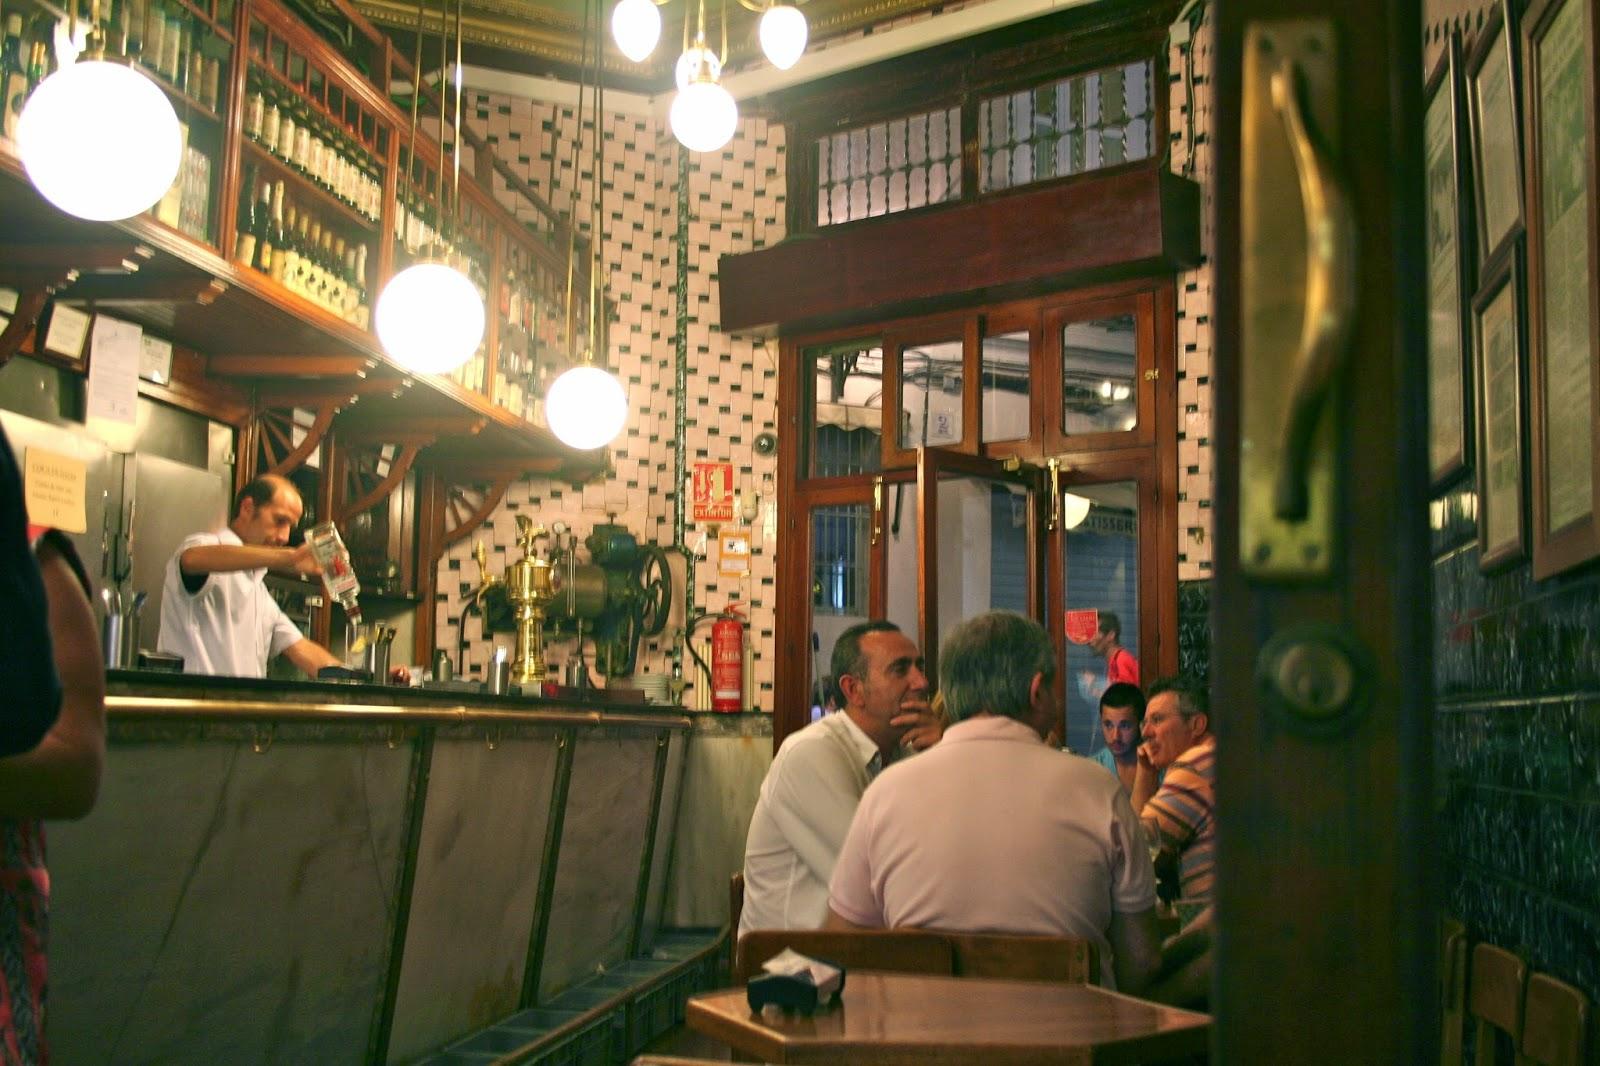 Valencia recomendaciones petit brioche dulce de leche el rall bar alhambra central bar casa montaña mercado de colon mercado central mercado ruzafa